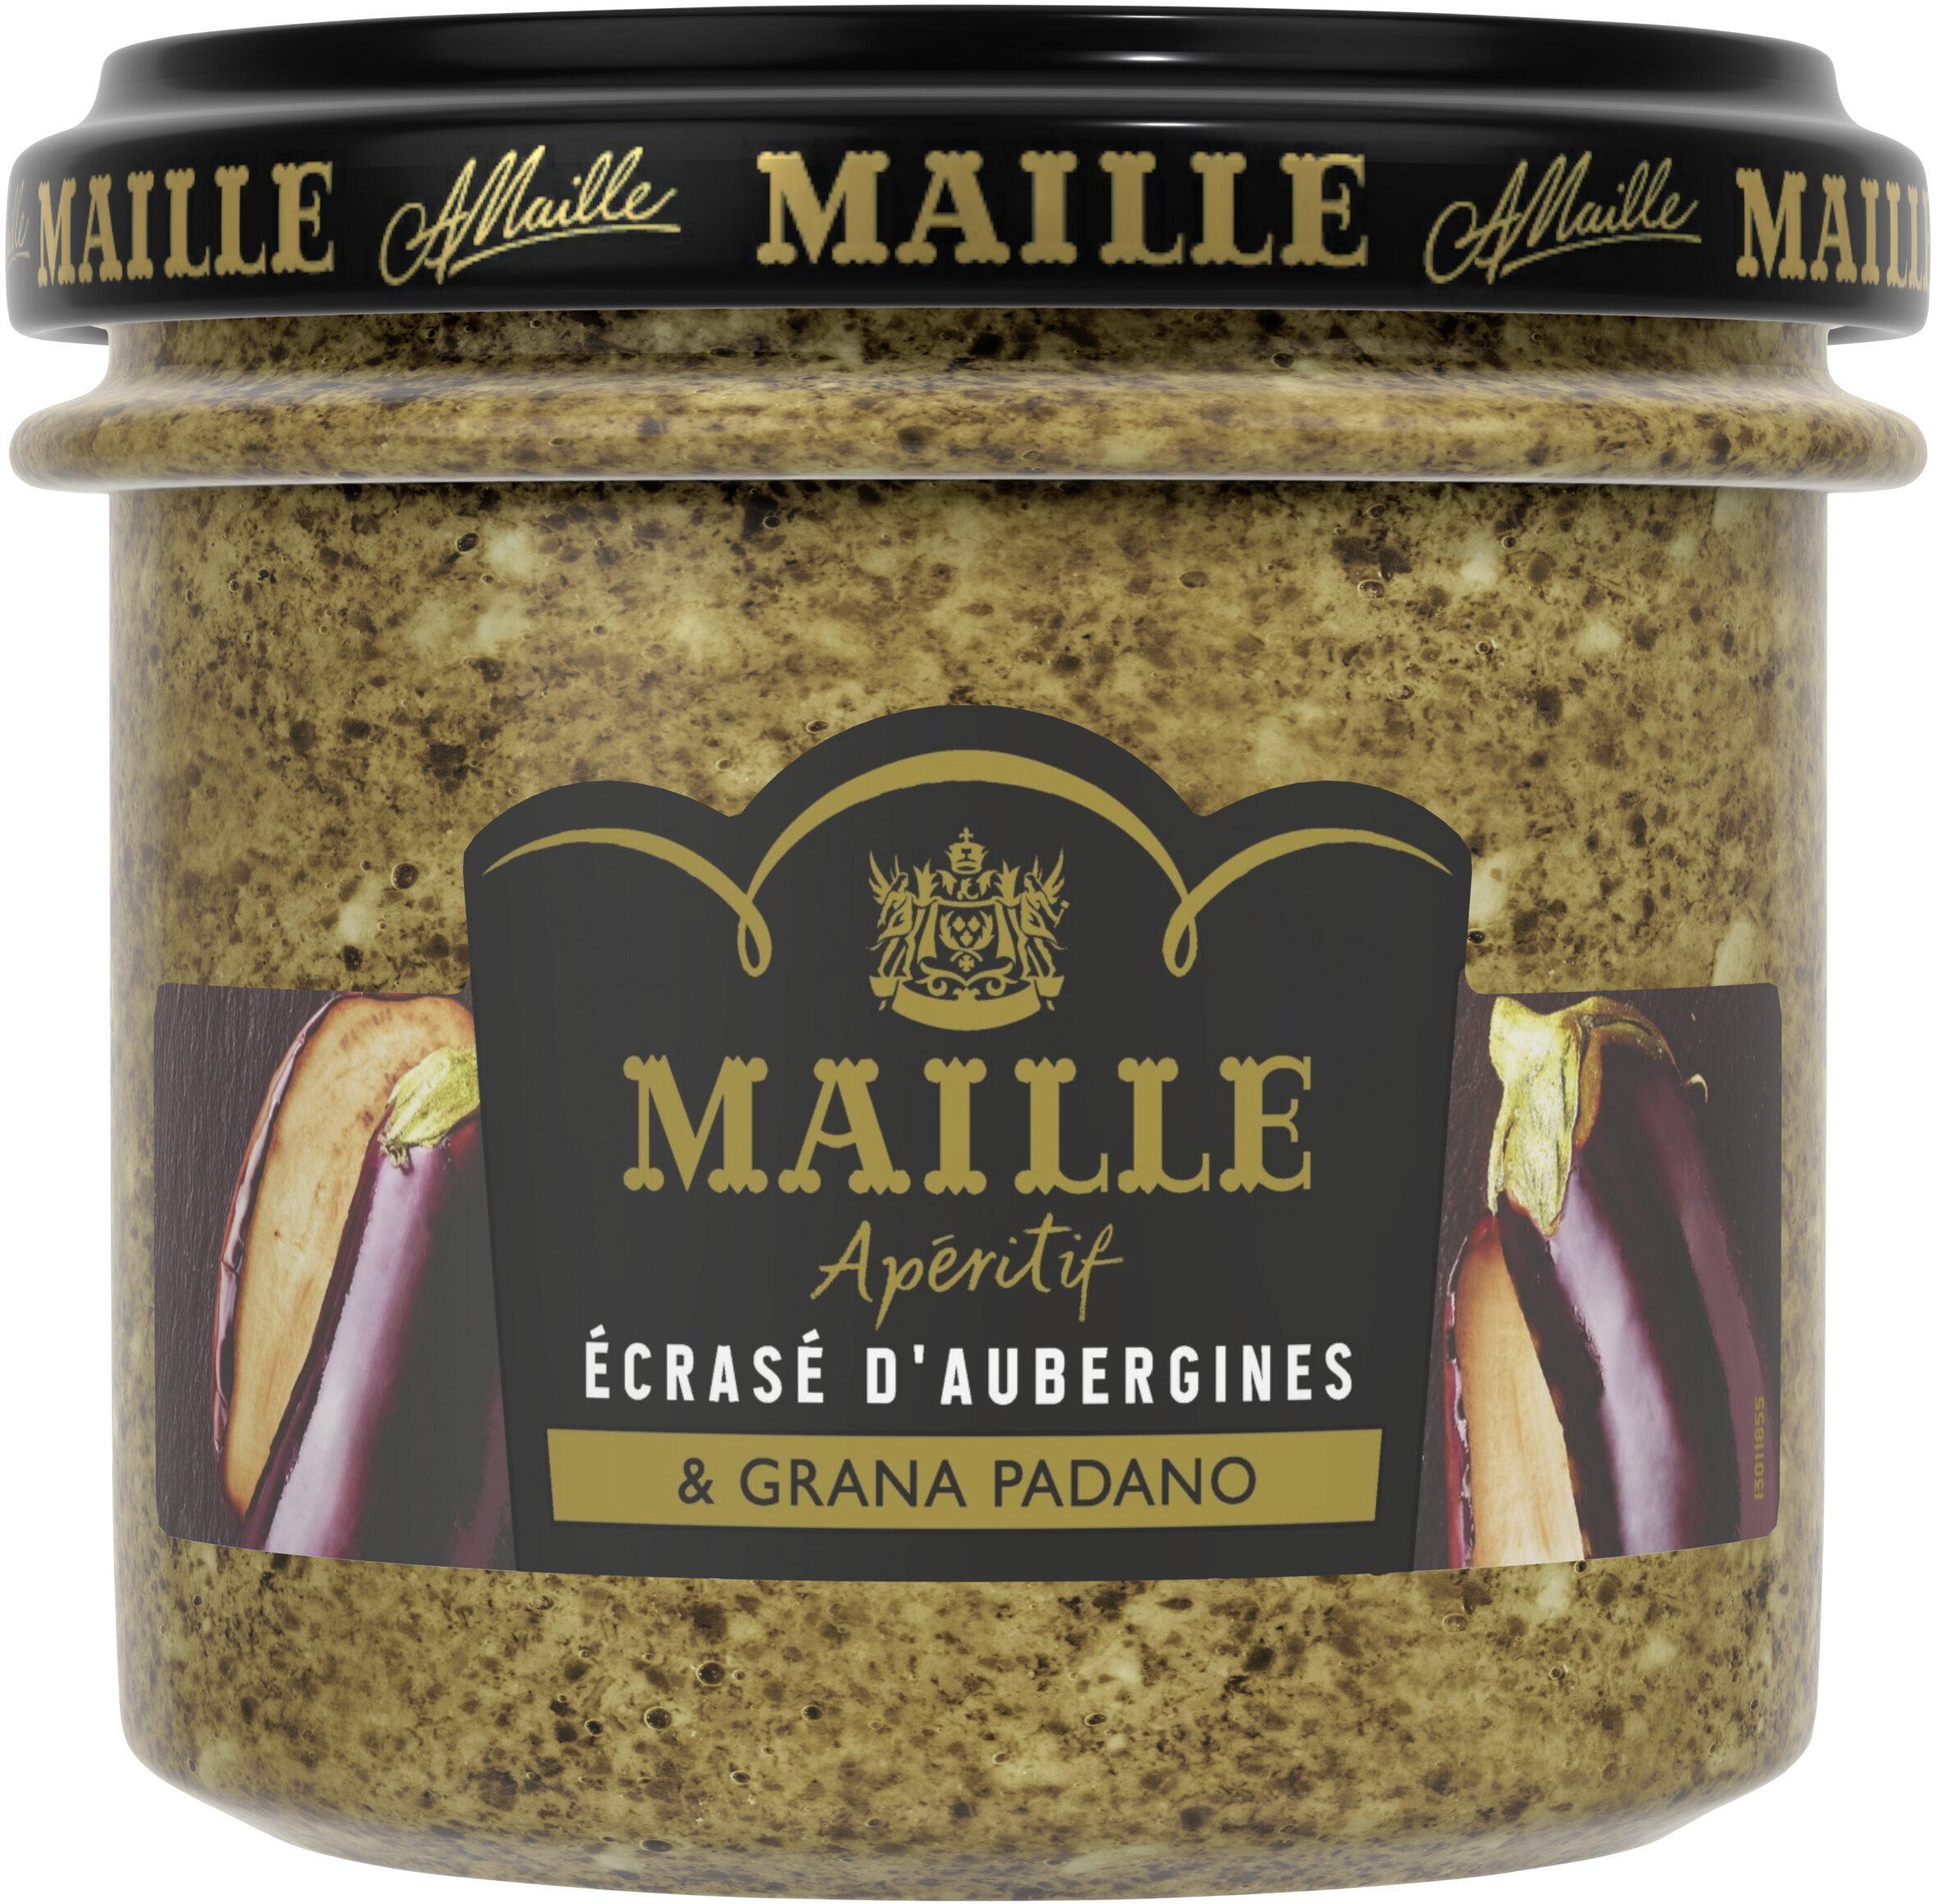 Maille Apéritif Écrasé d'Aubergines & Grana Padano - Product - fr